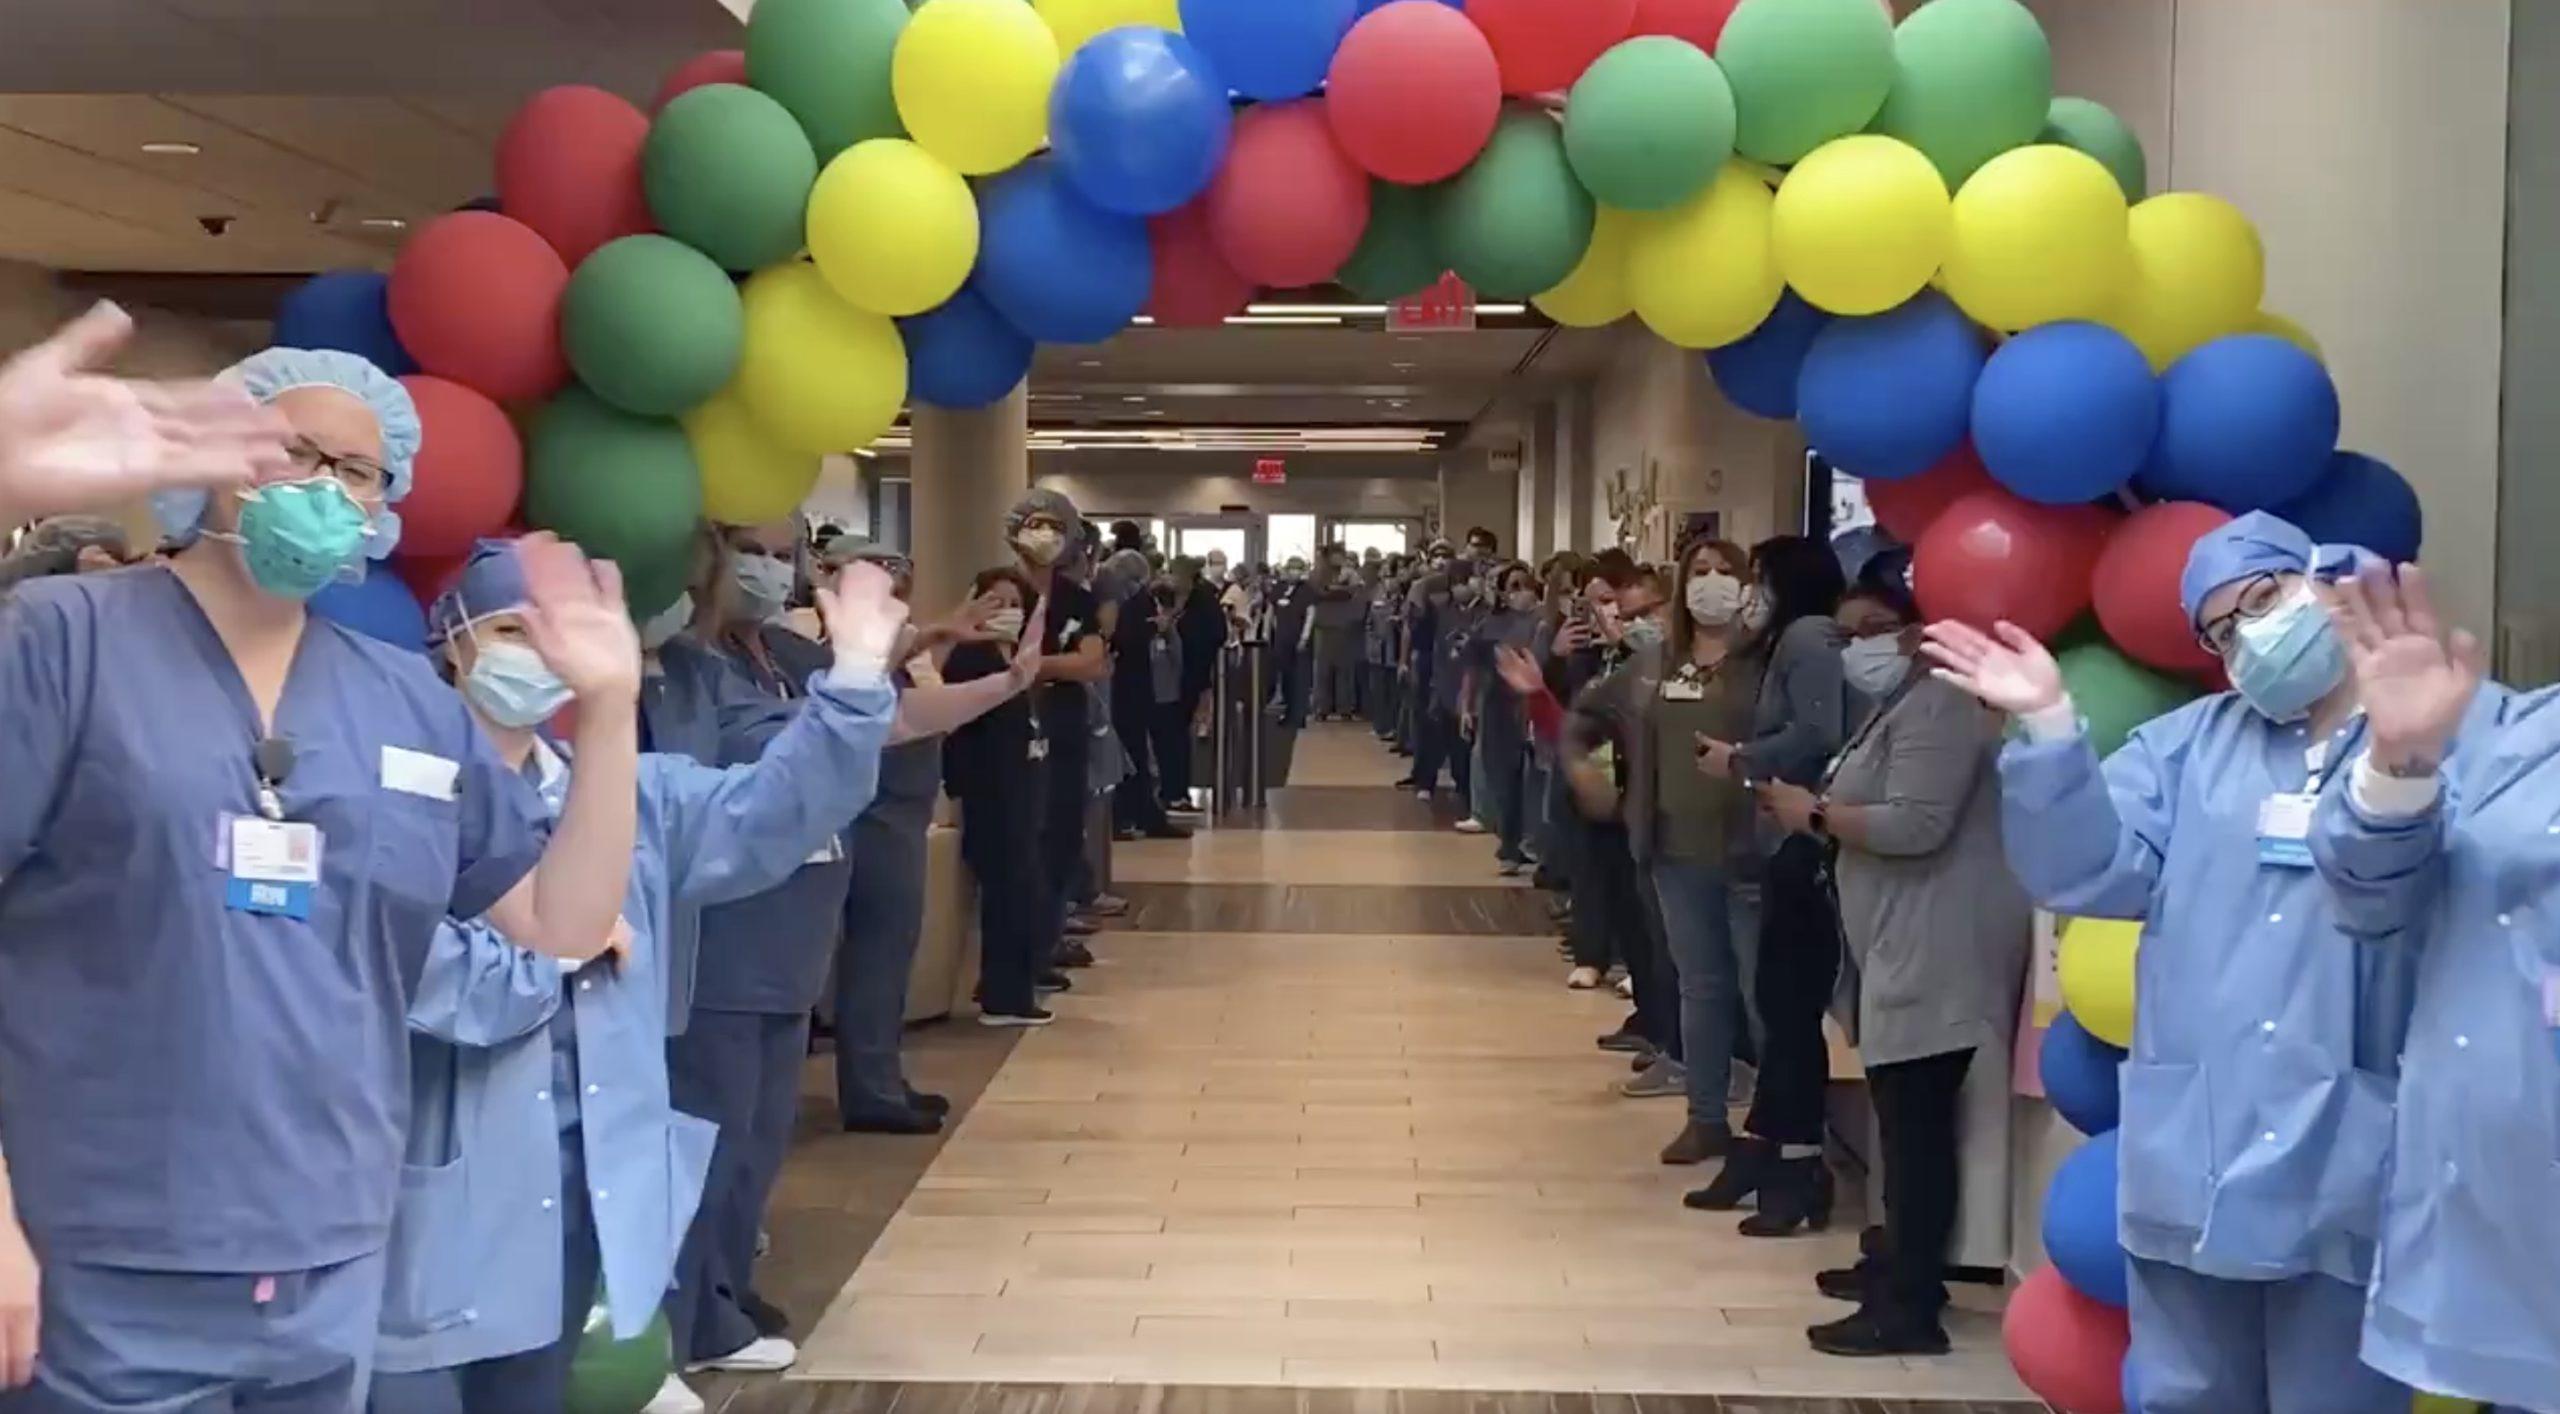 coronavirus patient released from hospital